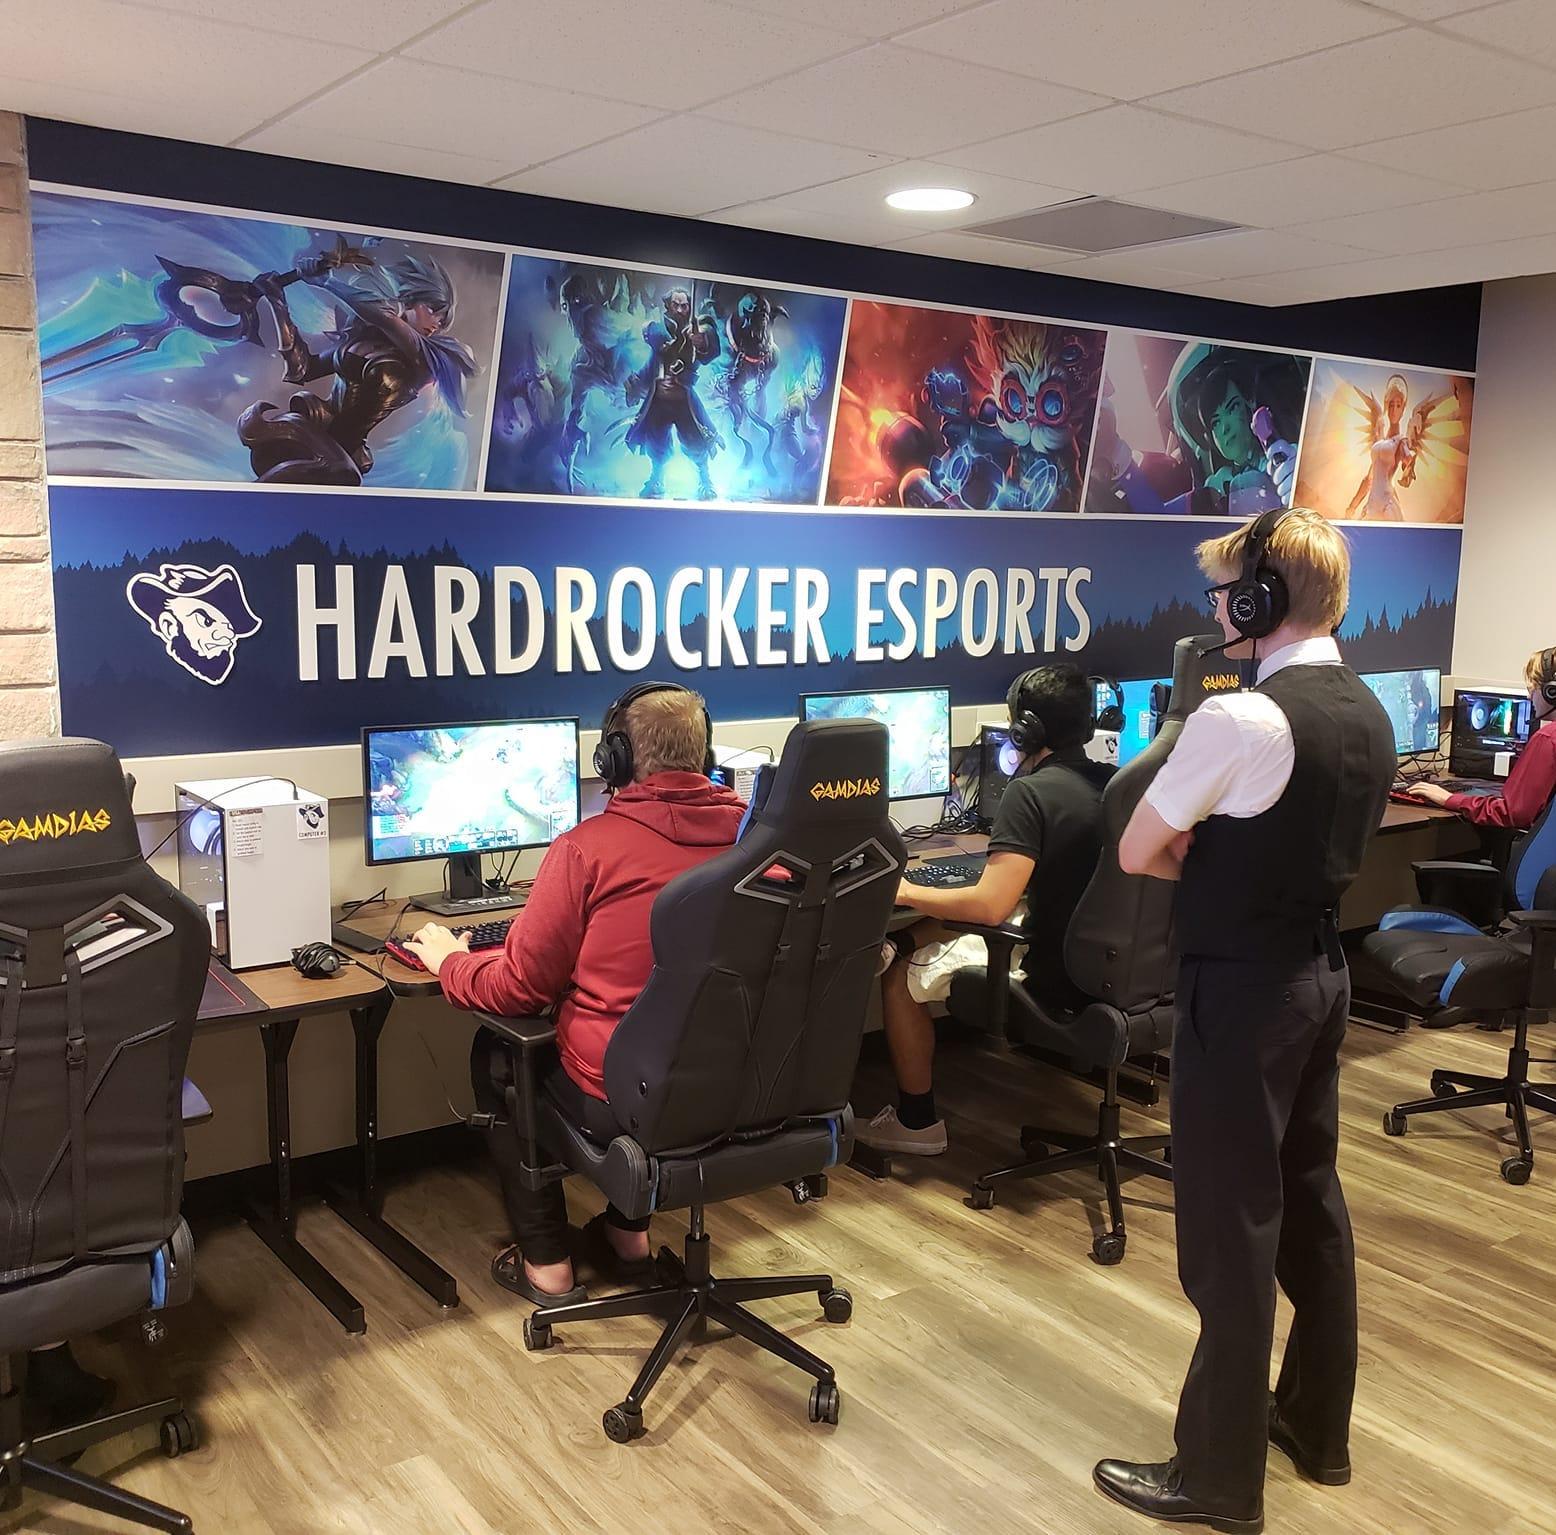 Video games reach next level for South Dakota enthusiasts